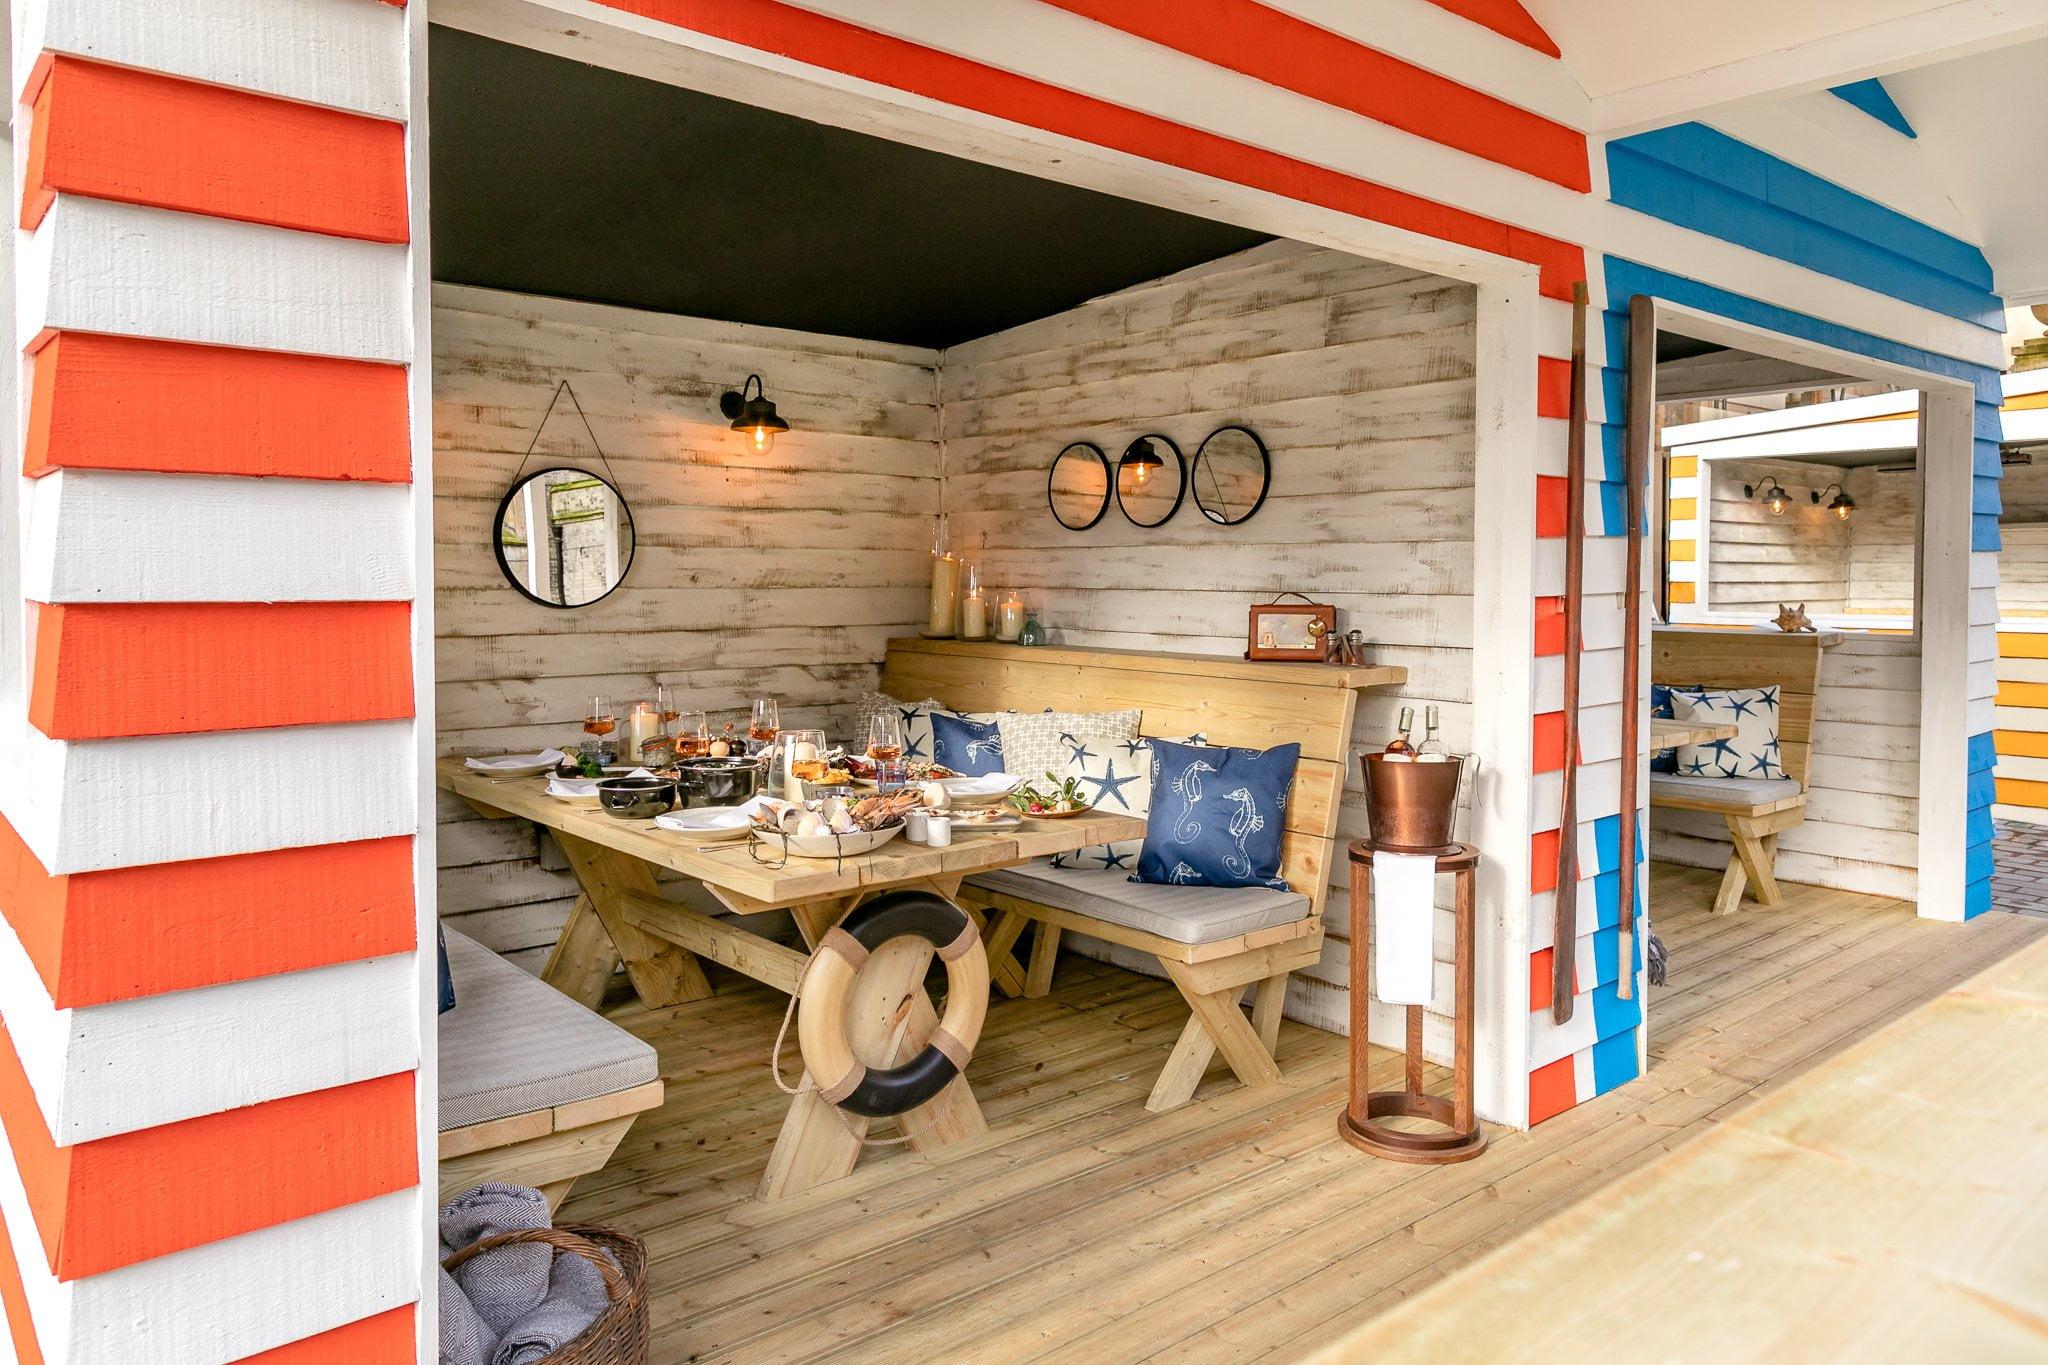 berkeley beach huts outdoor dining